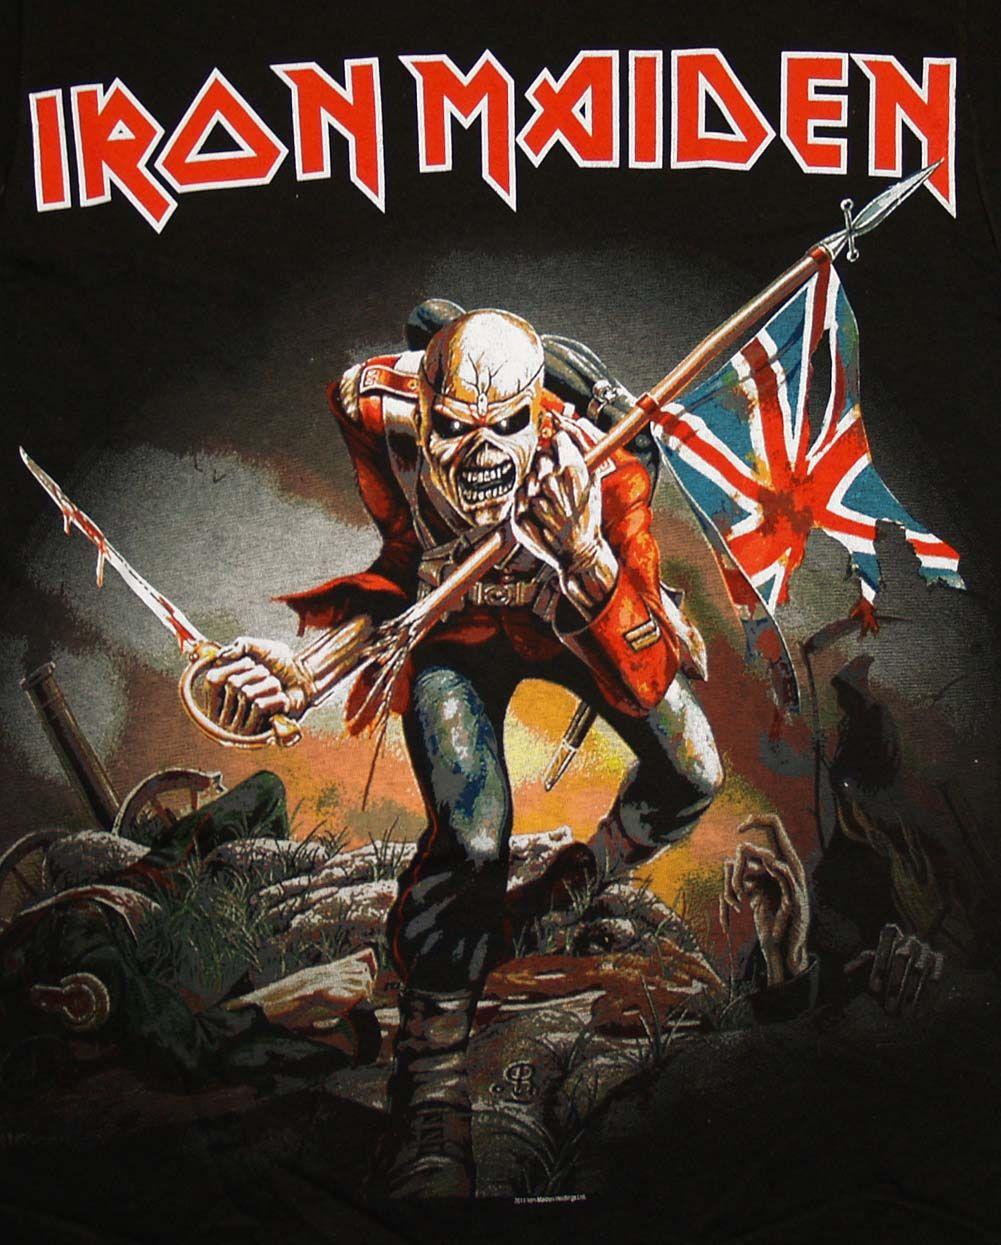 Iron Maiden The Trooper Wallpaper Images Click Wallpapers Iron Maiden The Trooper Iron Maiden Posters Iron Maiden Eddie